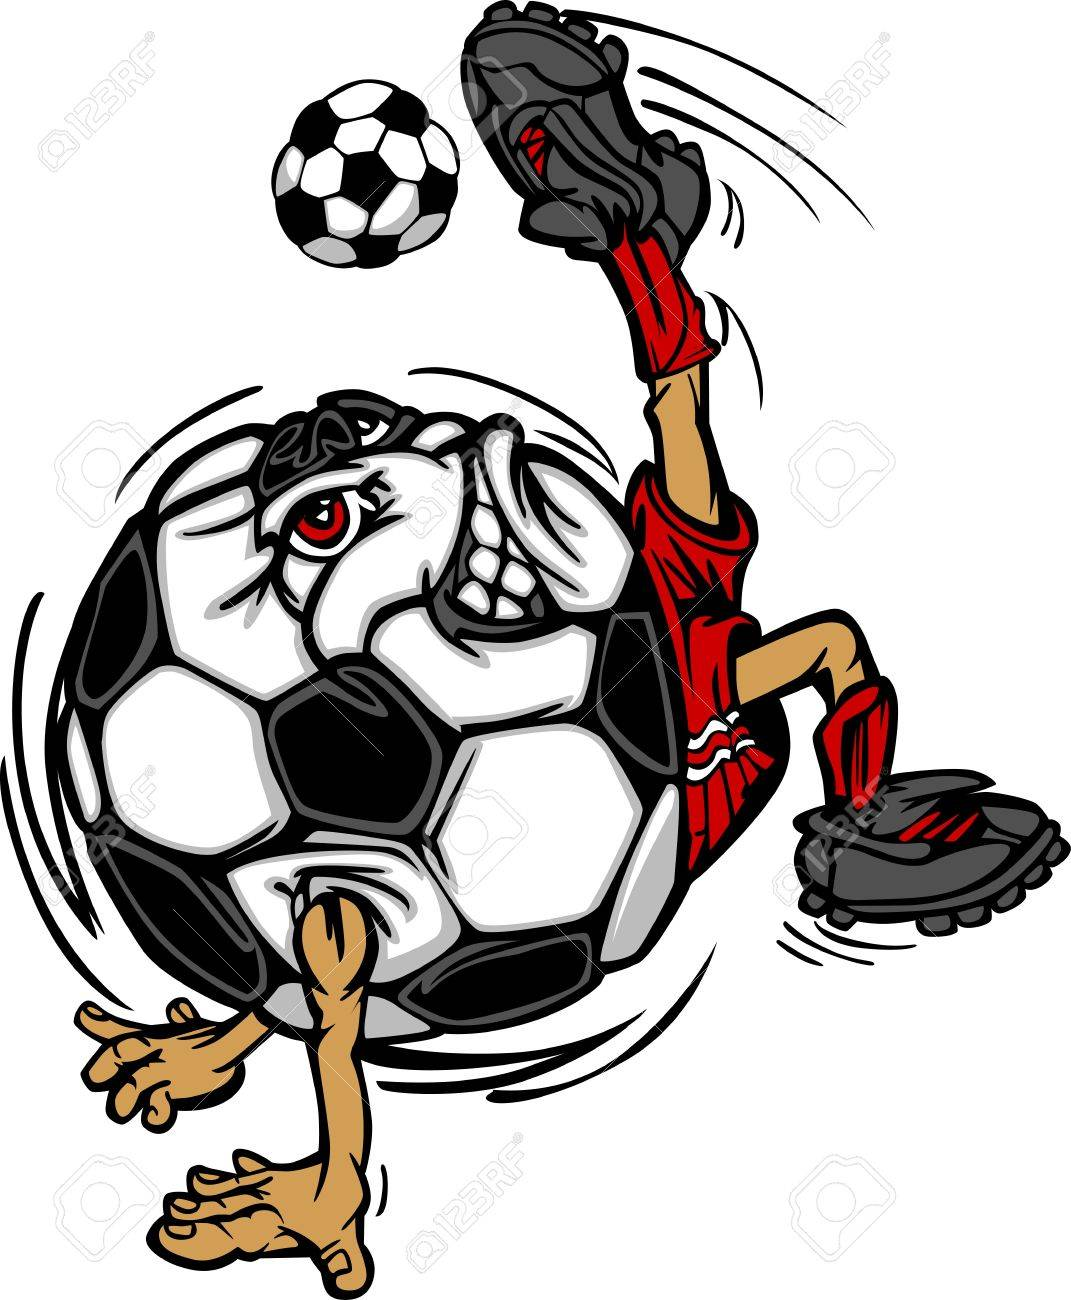 Soccer Football Ball Player Cartoon Stock Vector - 10679789